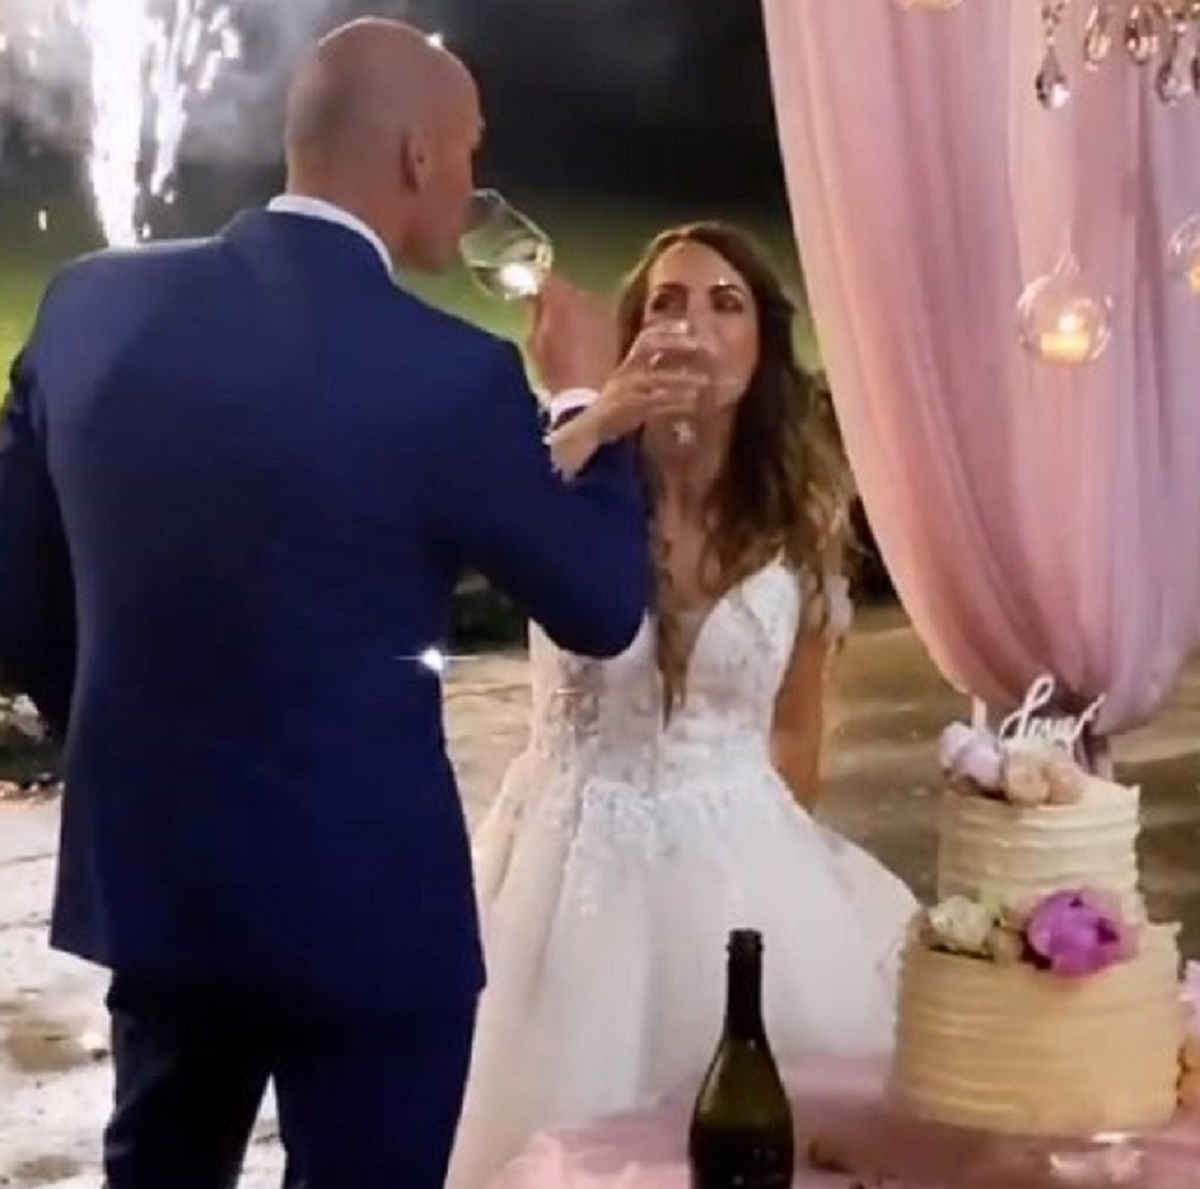 Mauro Faettini Lisa Palugan Uomini e Donne nozze